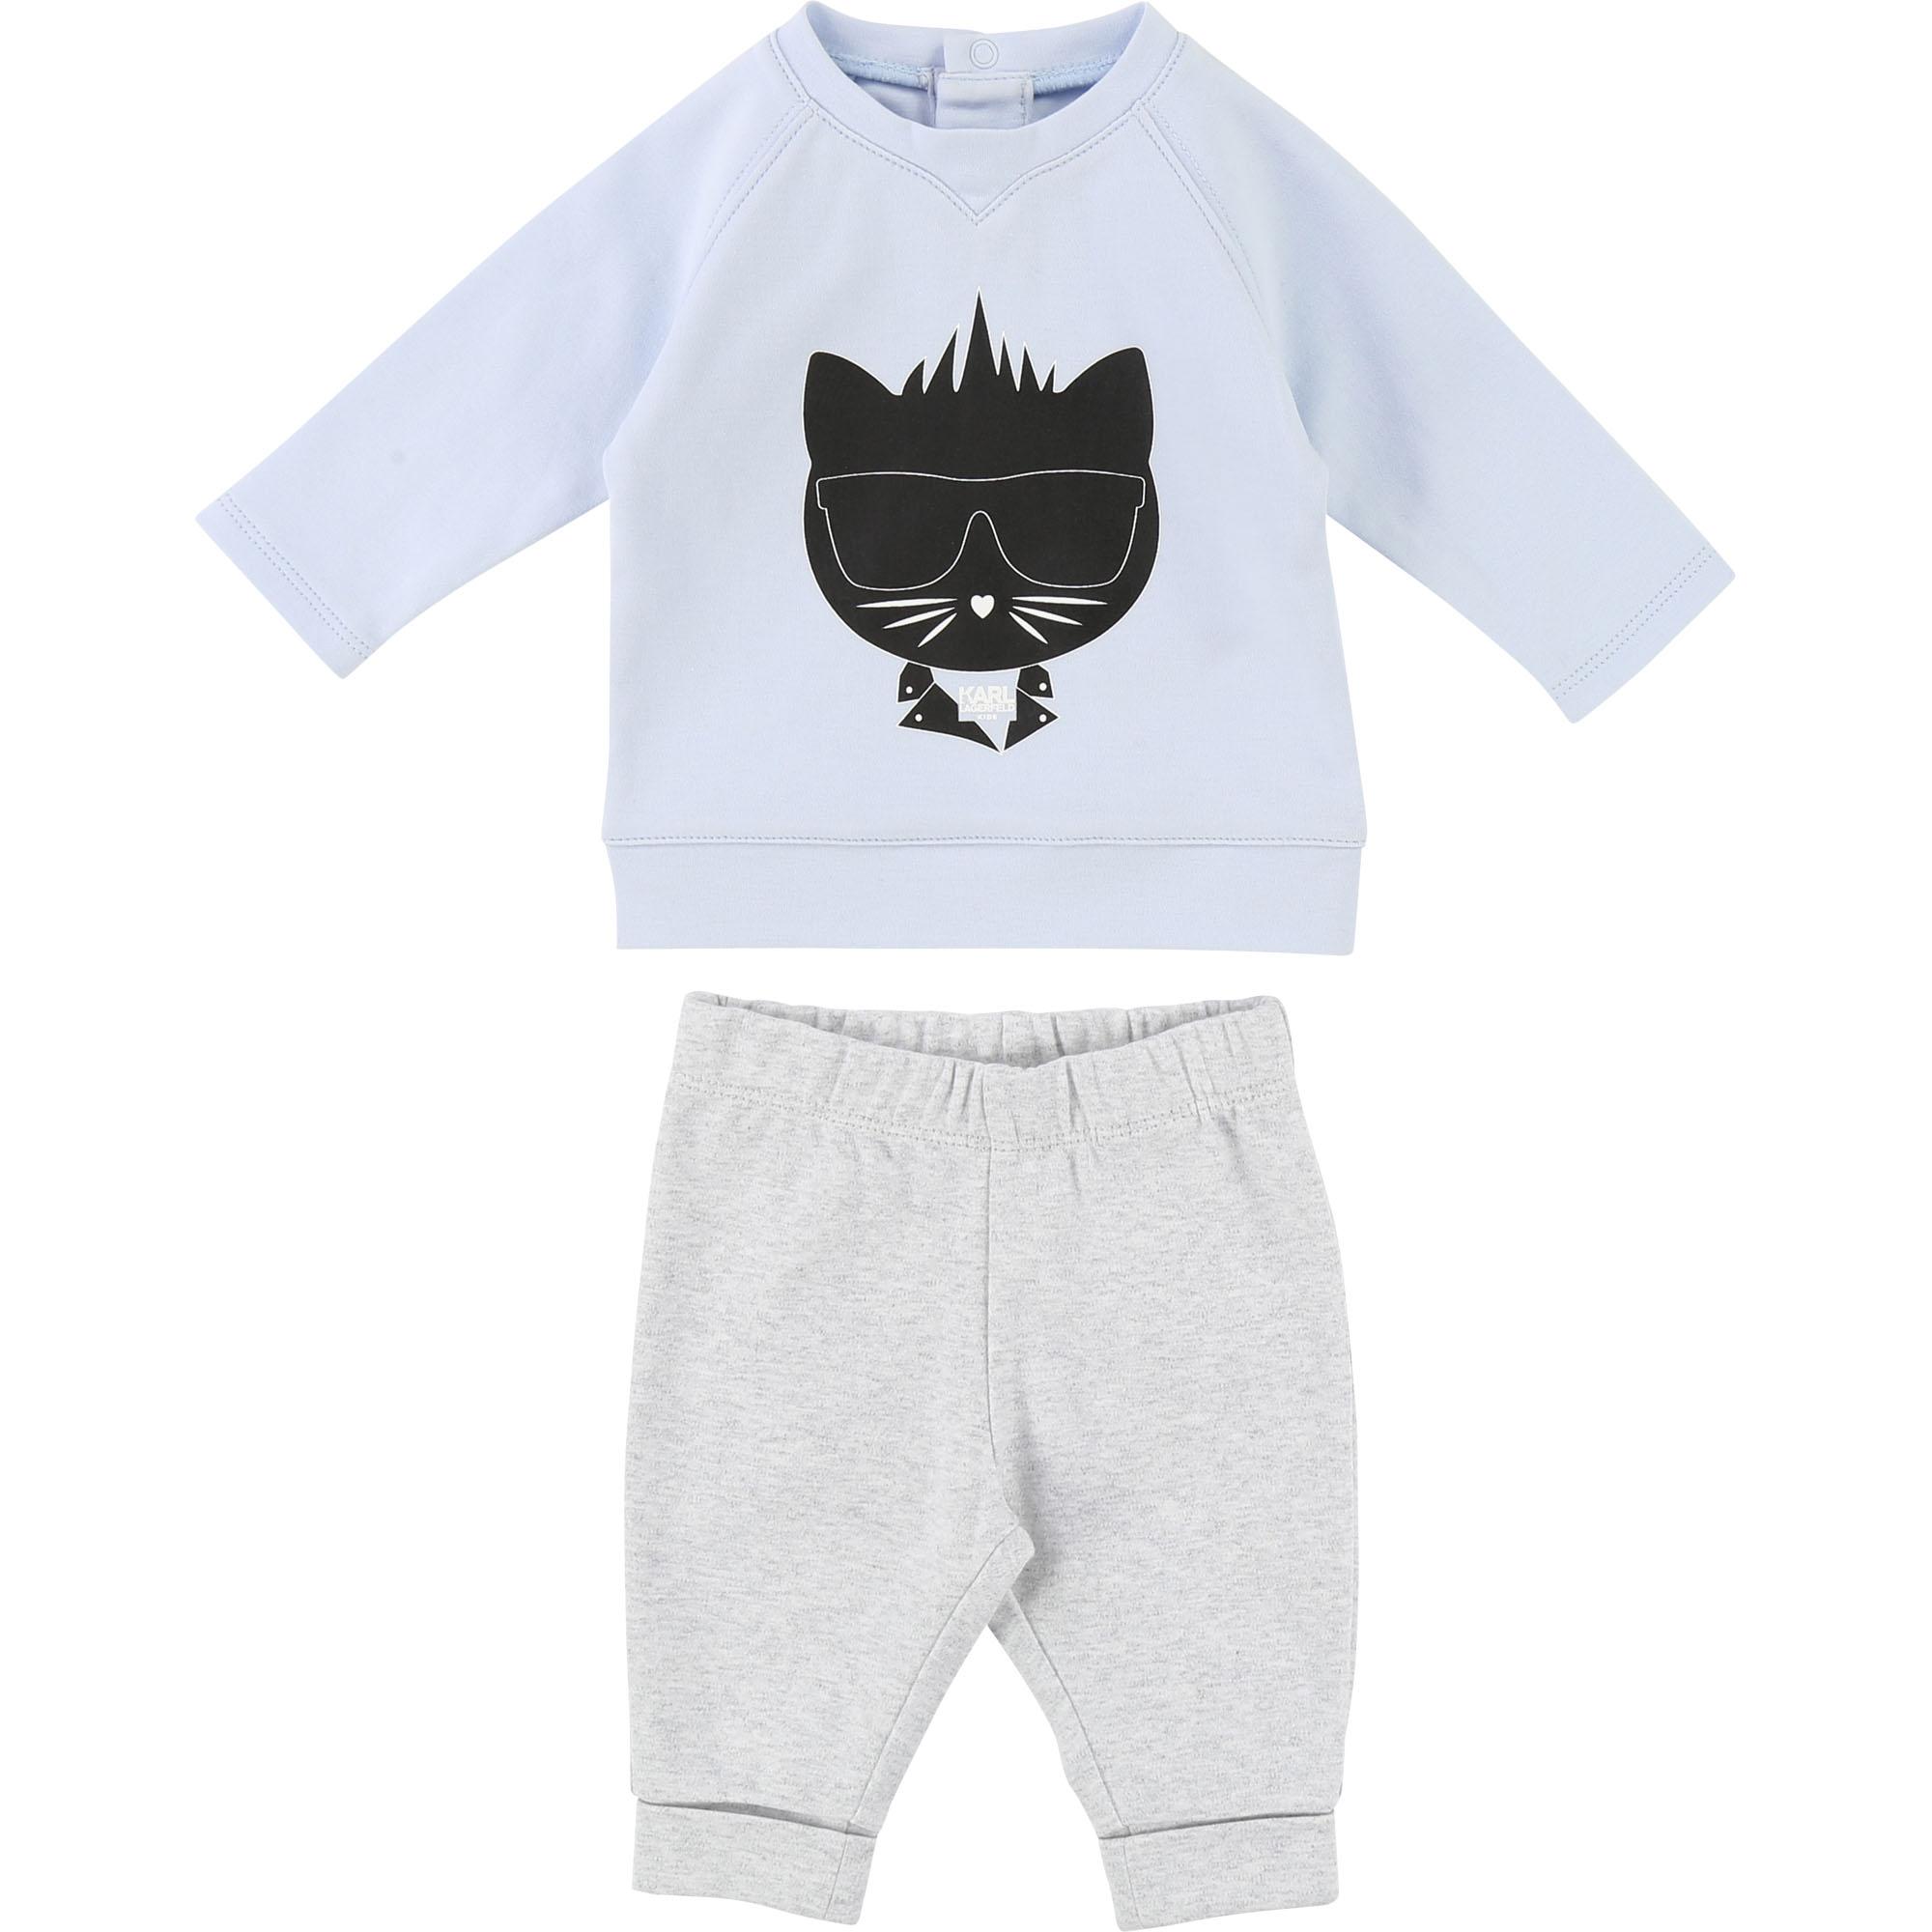 Karl Lagerfeld baby set in light blue-grey